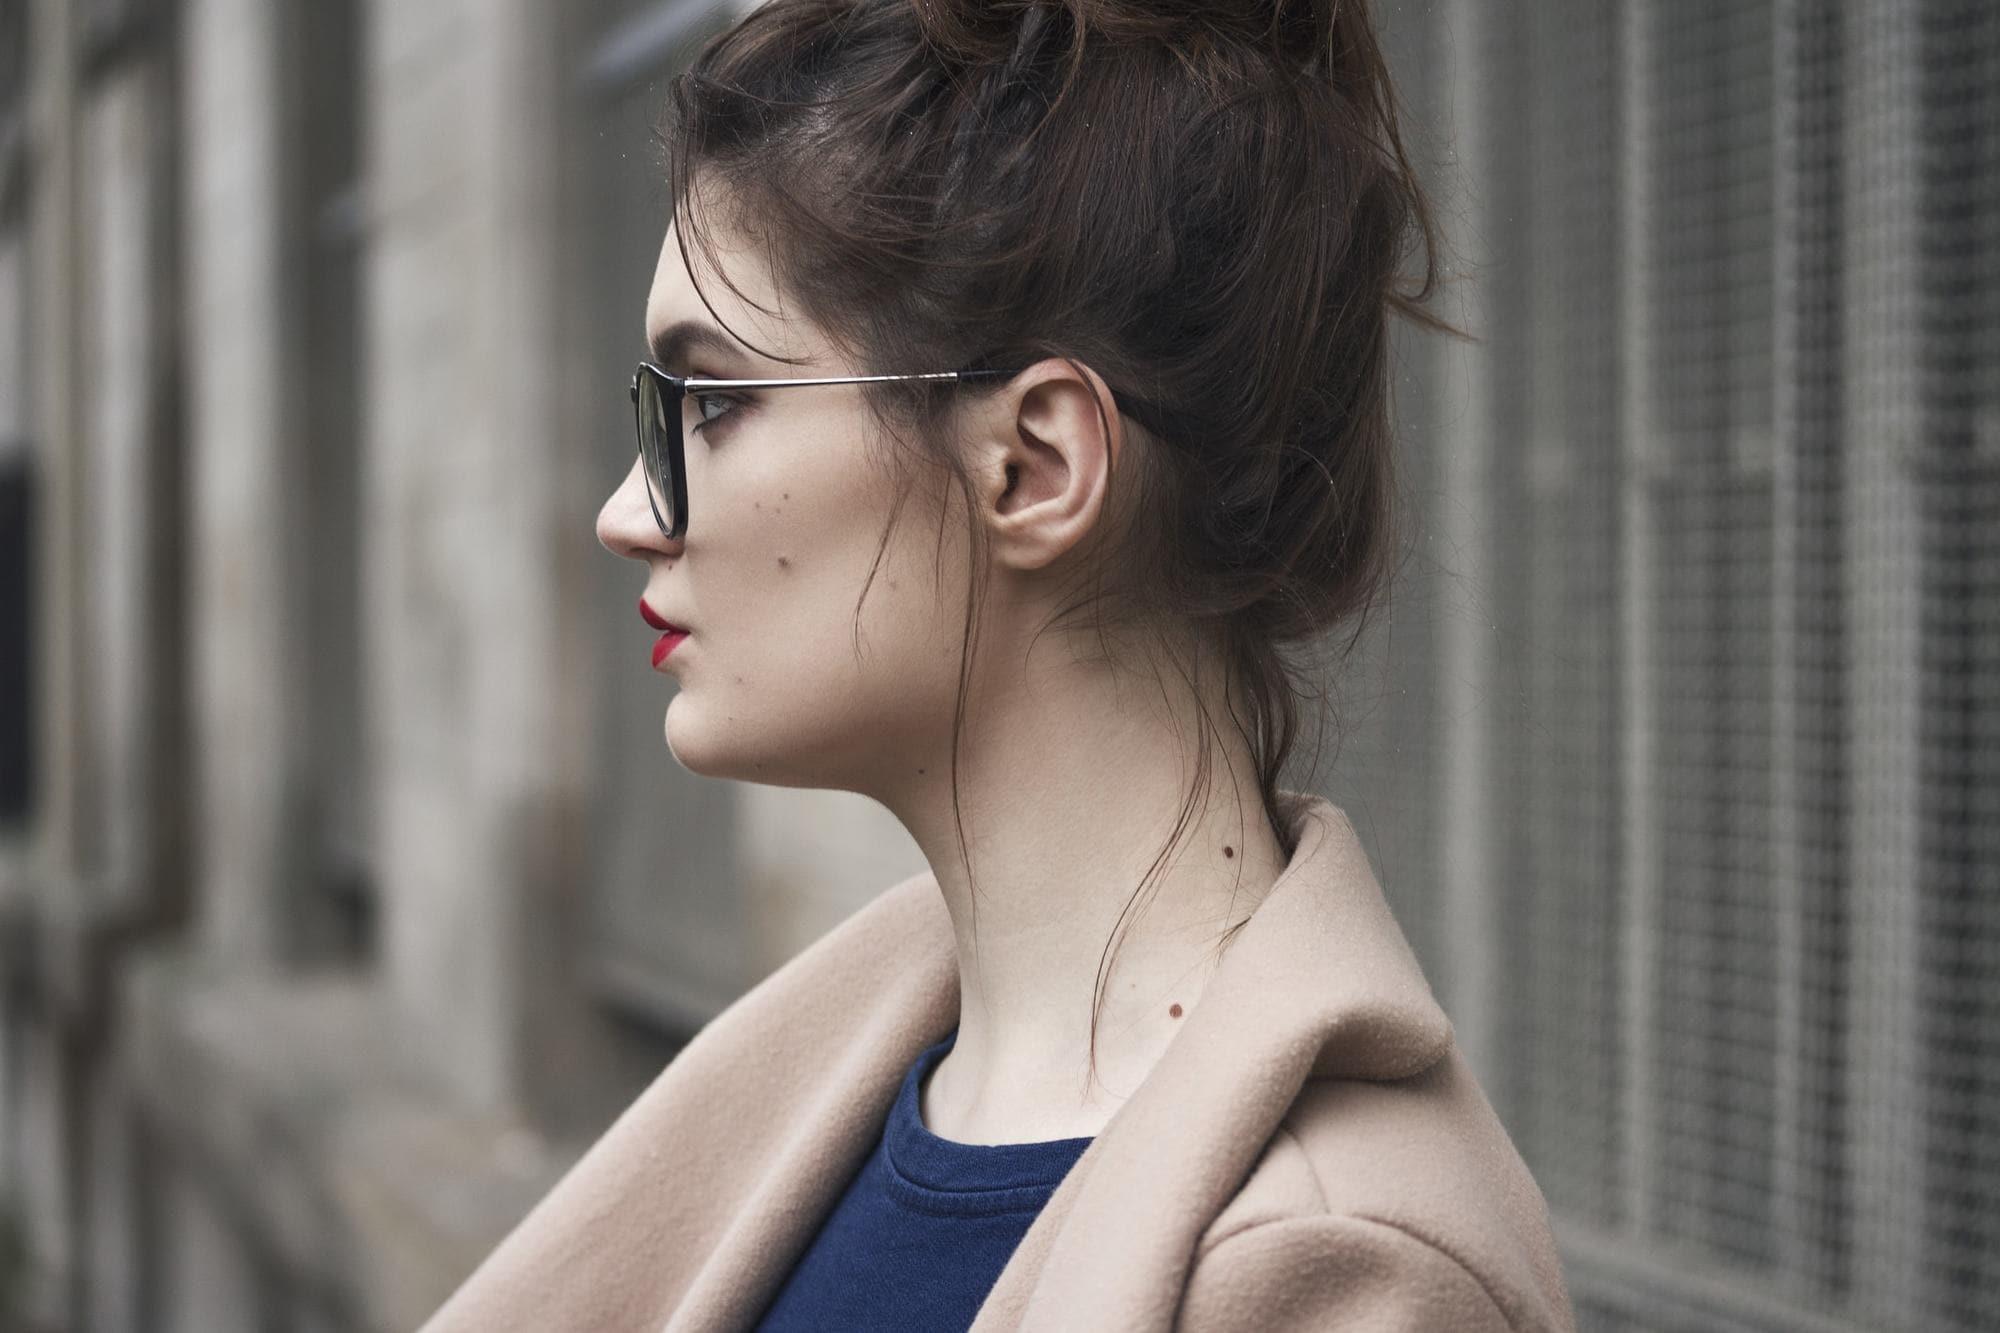 hair loss in women messy bun brunette